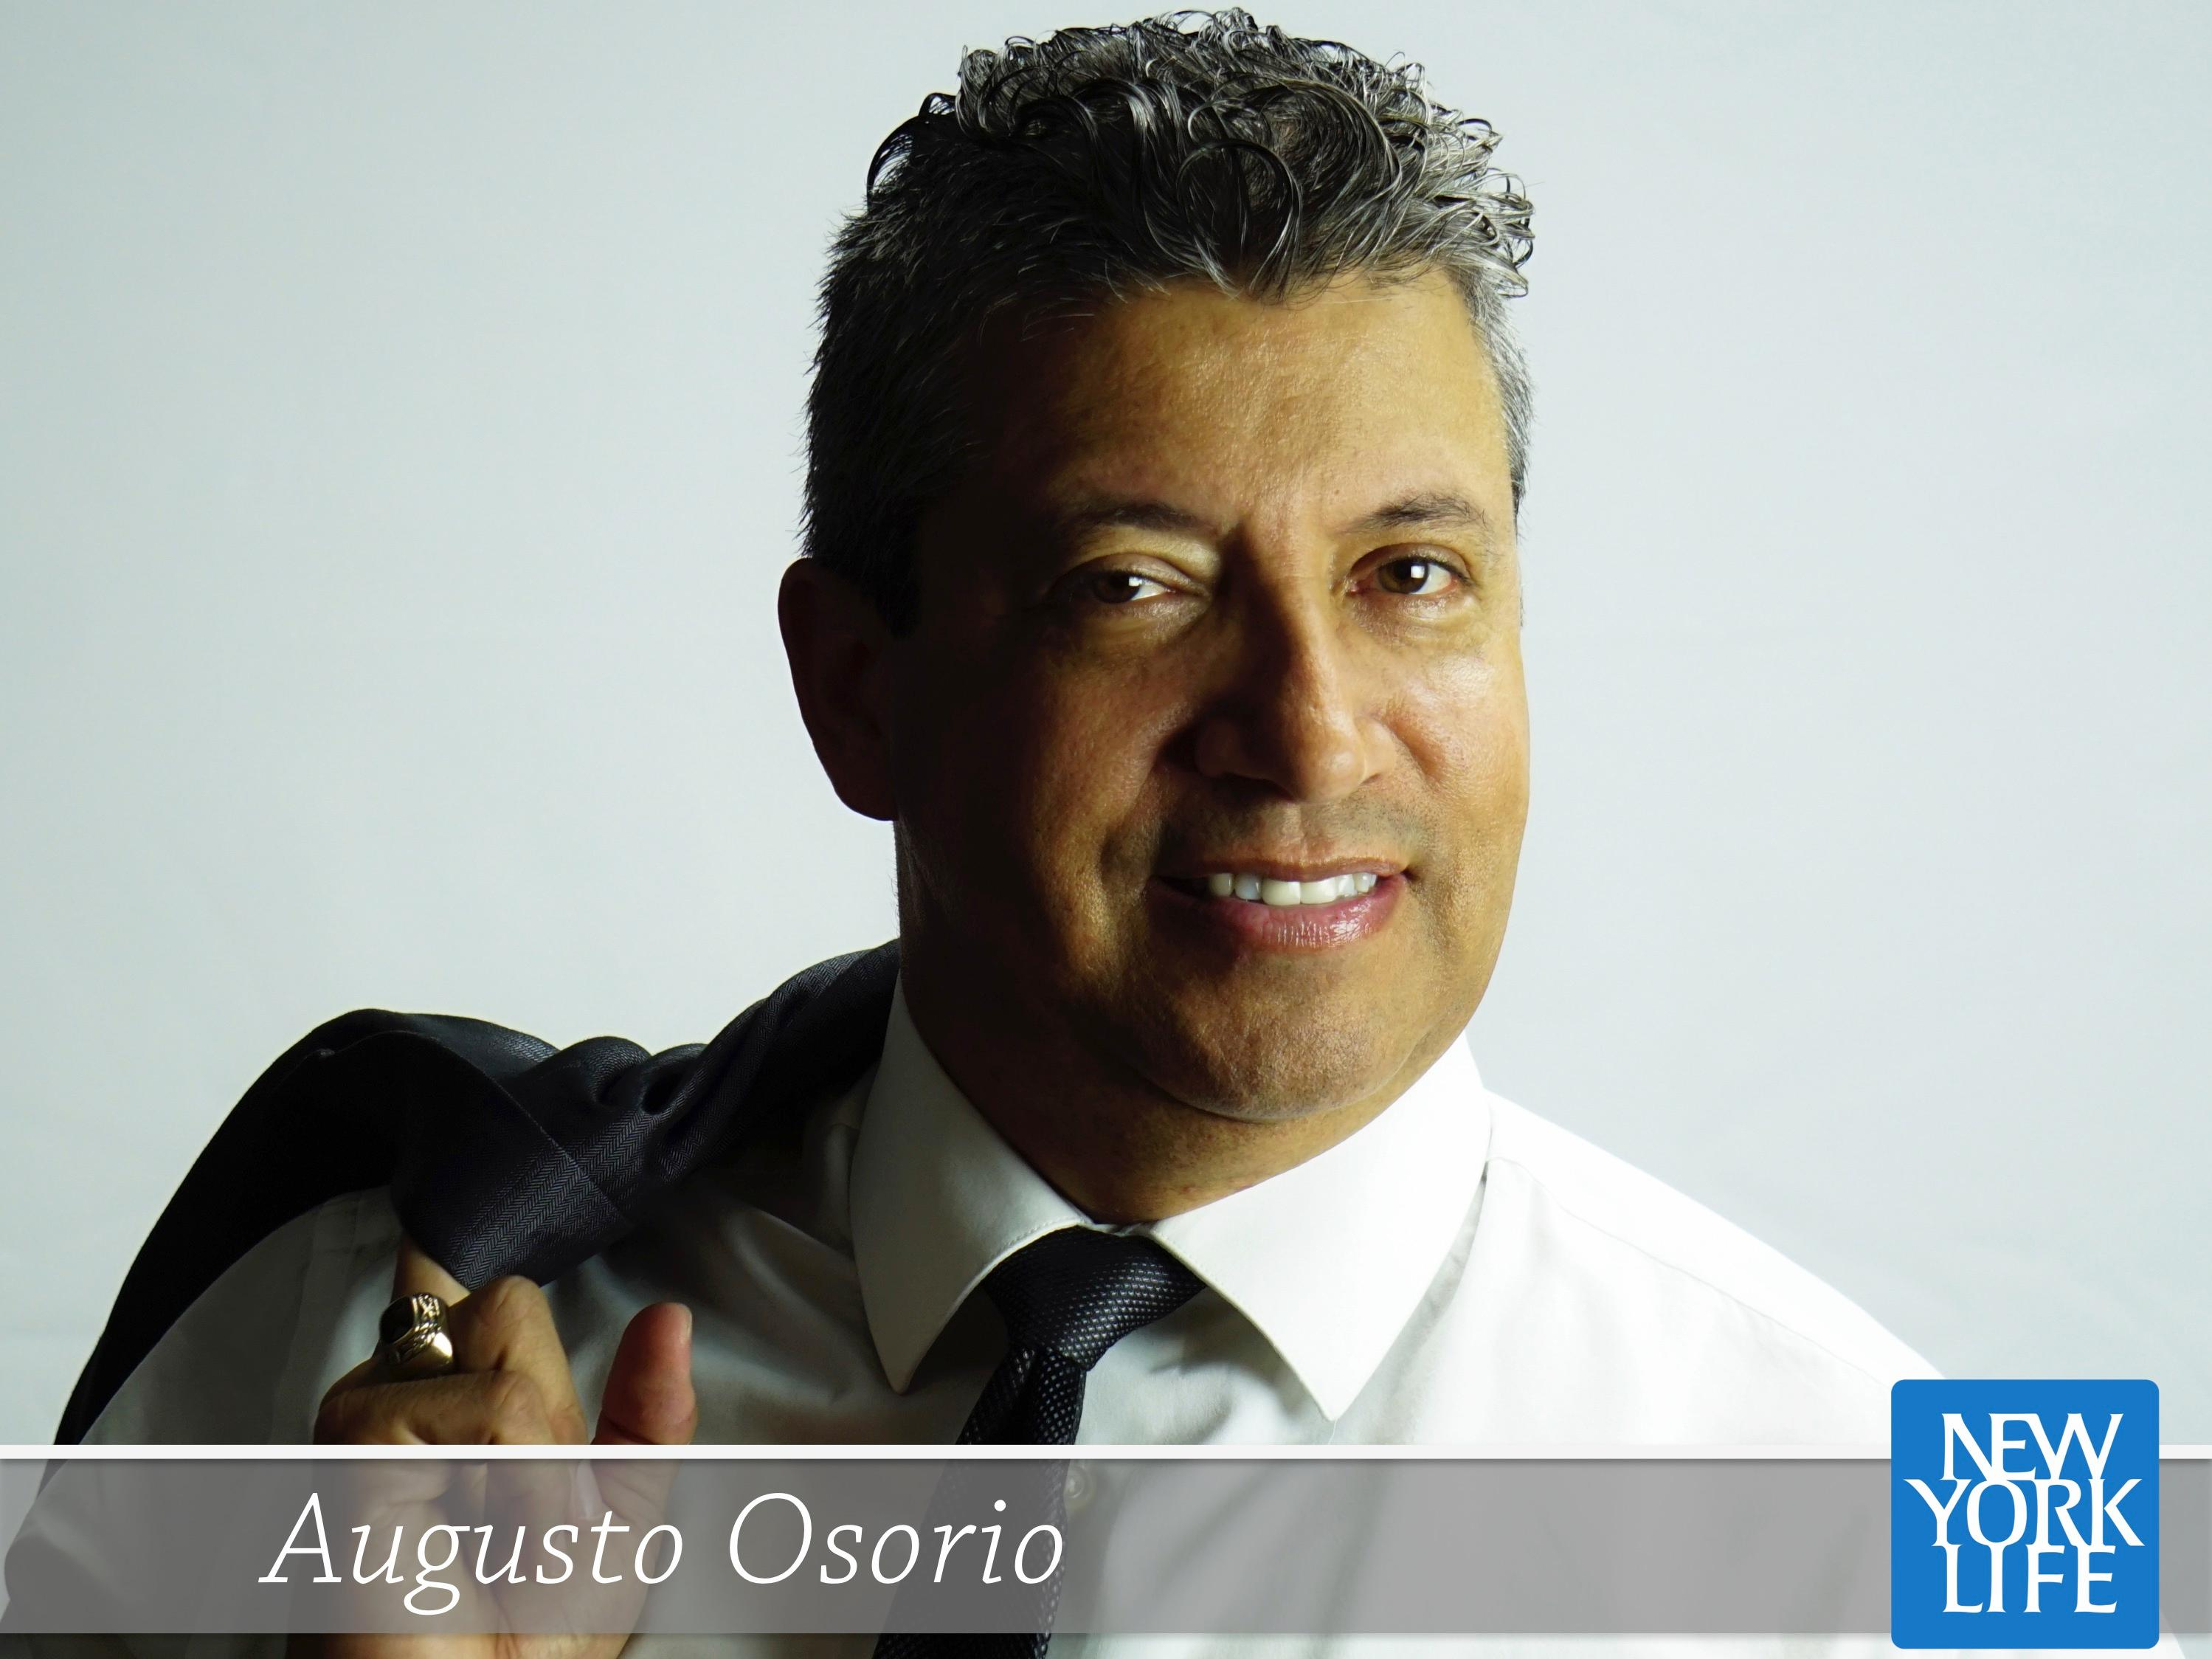 AUGUSTO LEON OSORIO Financial Professional & Insurance Agent